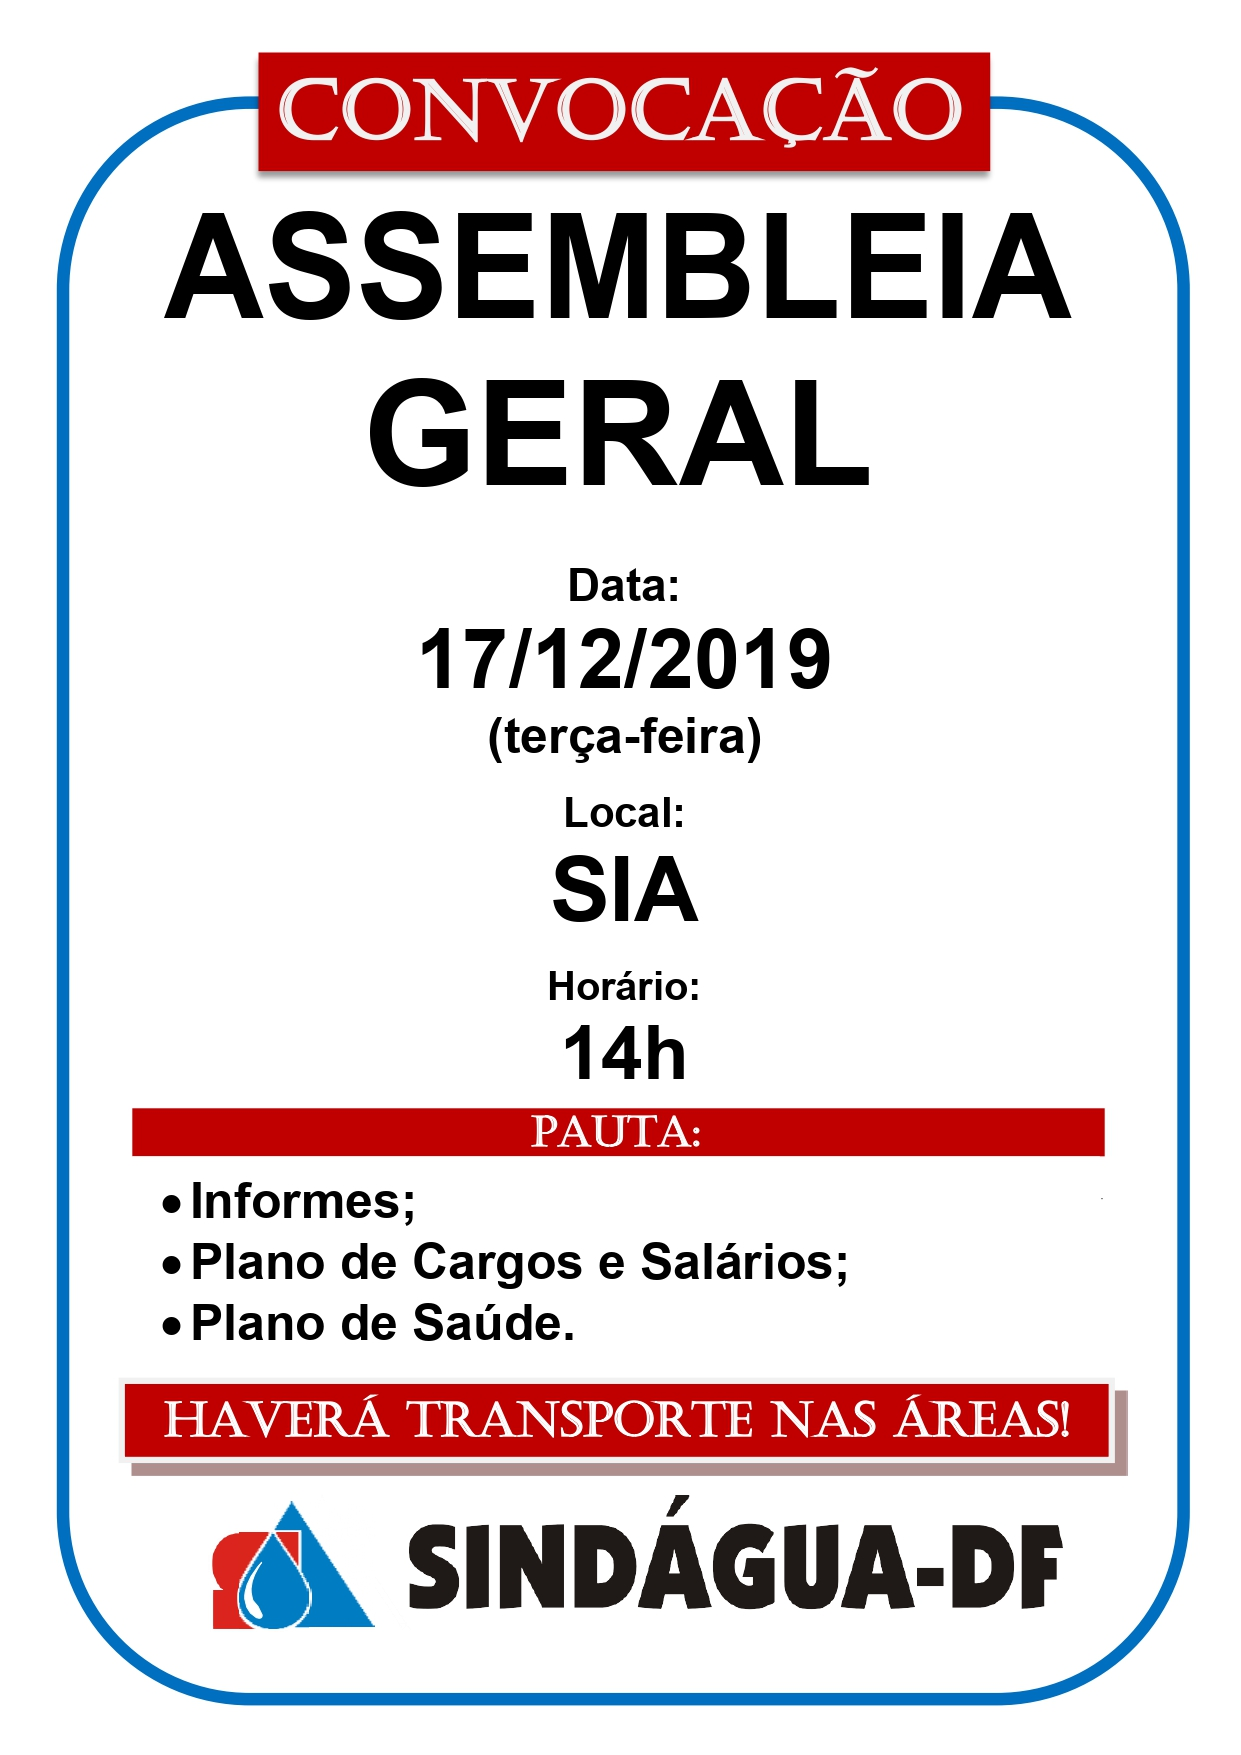 ASSEMBLEIA GERAL 17/12/2019